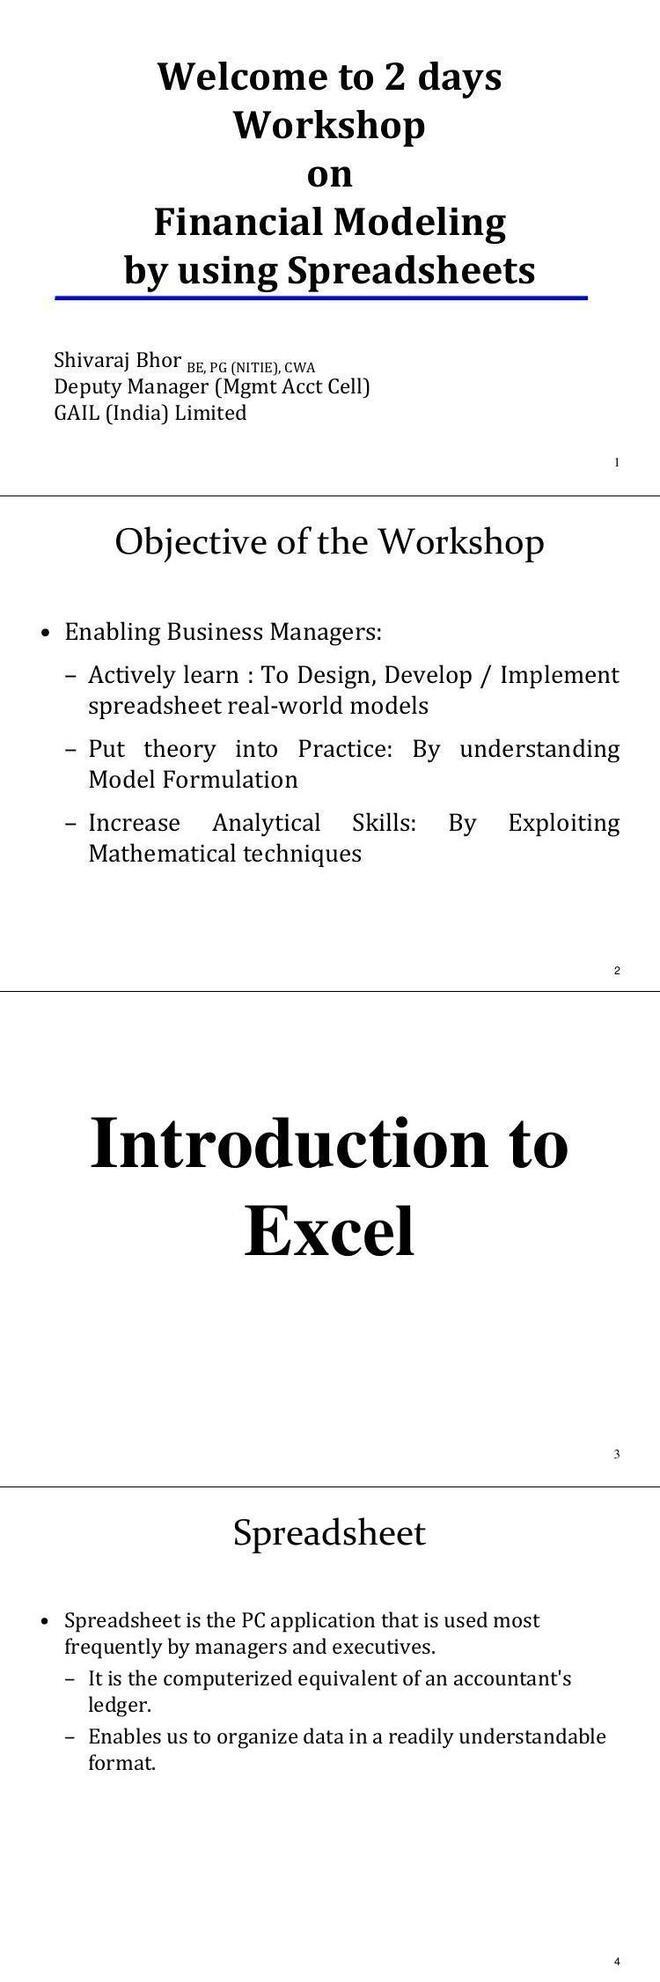 PDF] EXCEL training workshop on Financial Modeling - Free